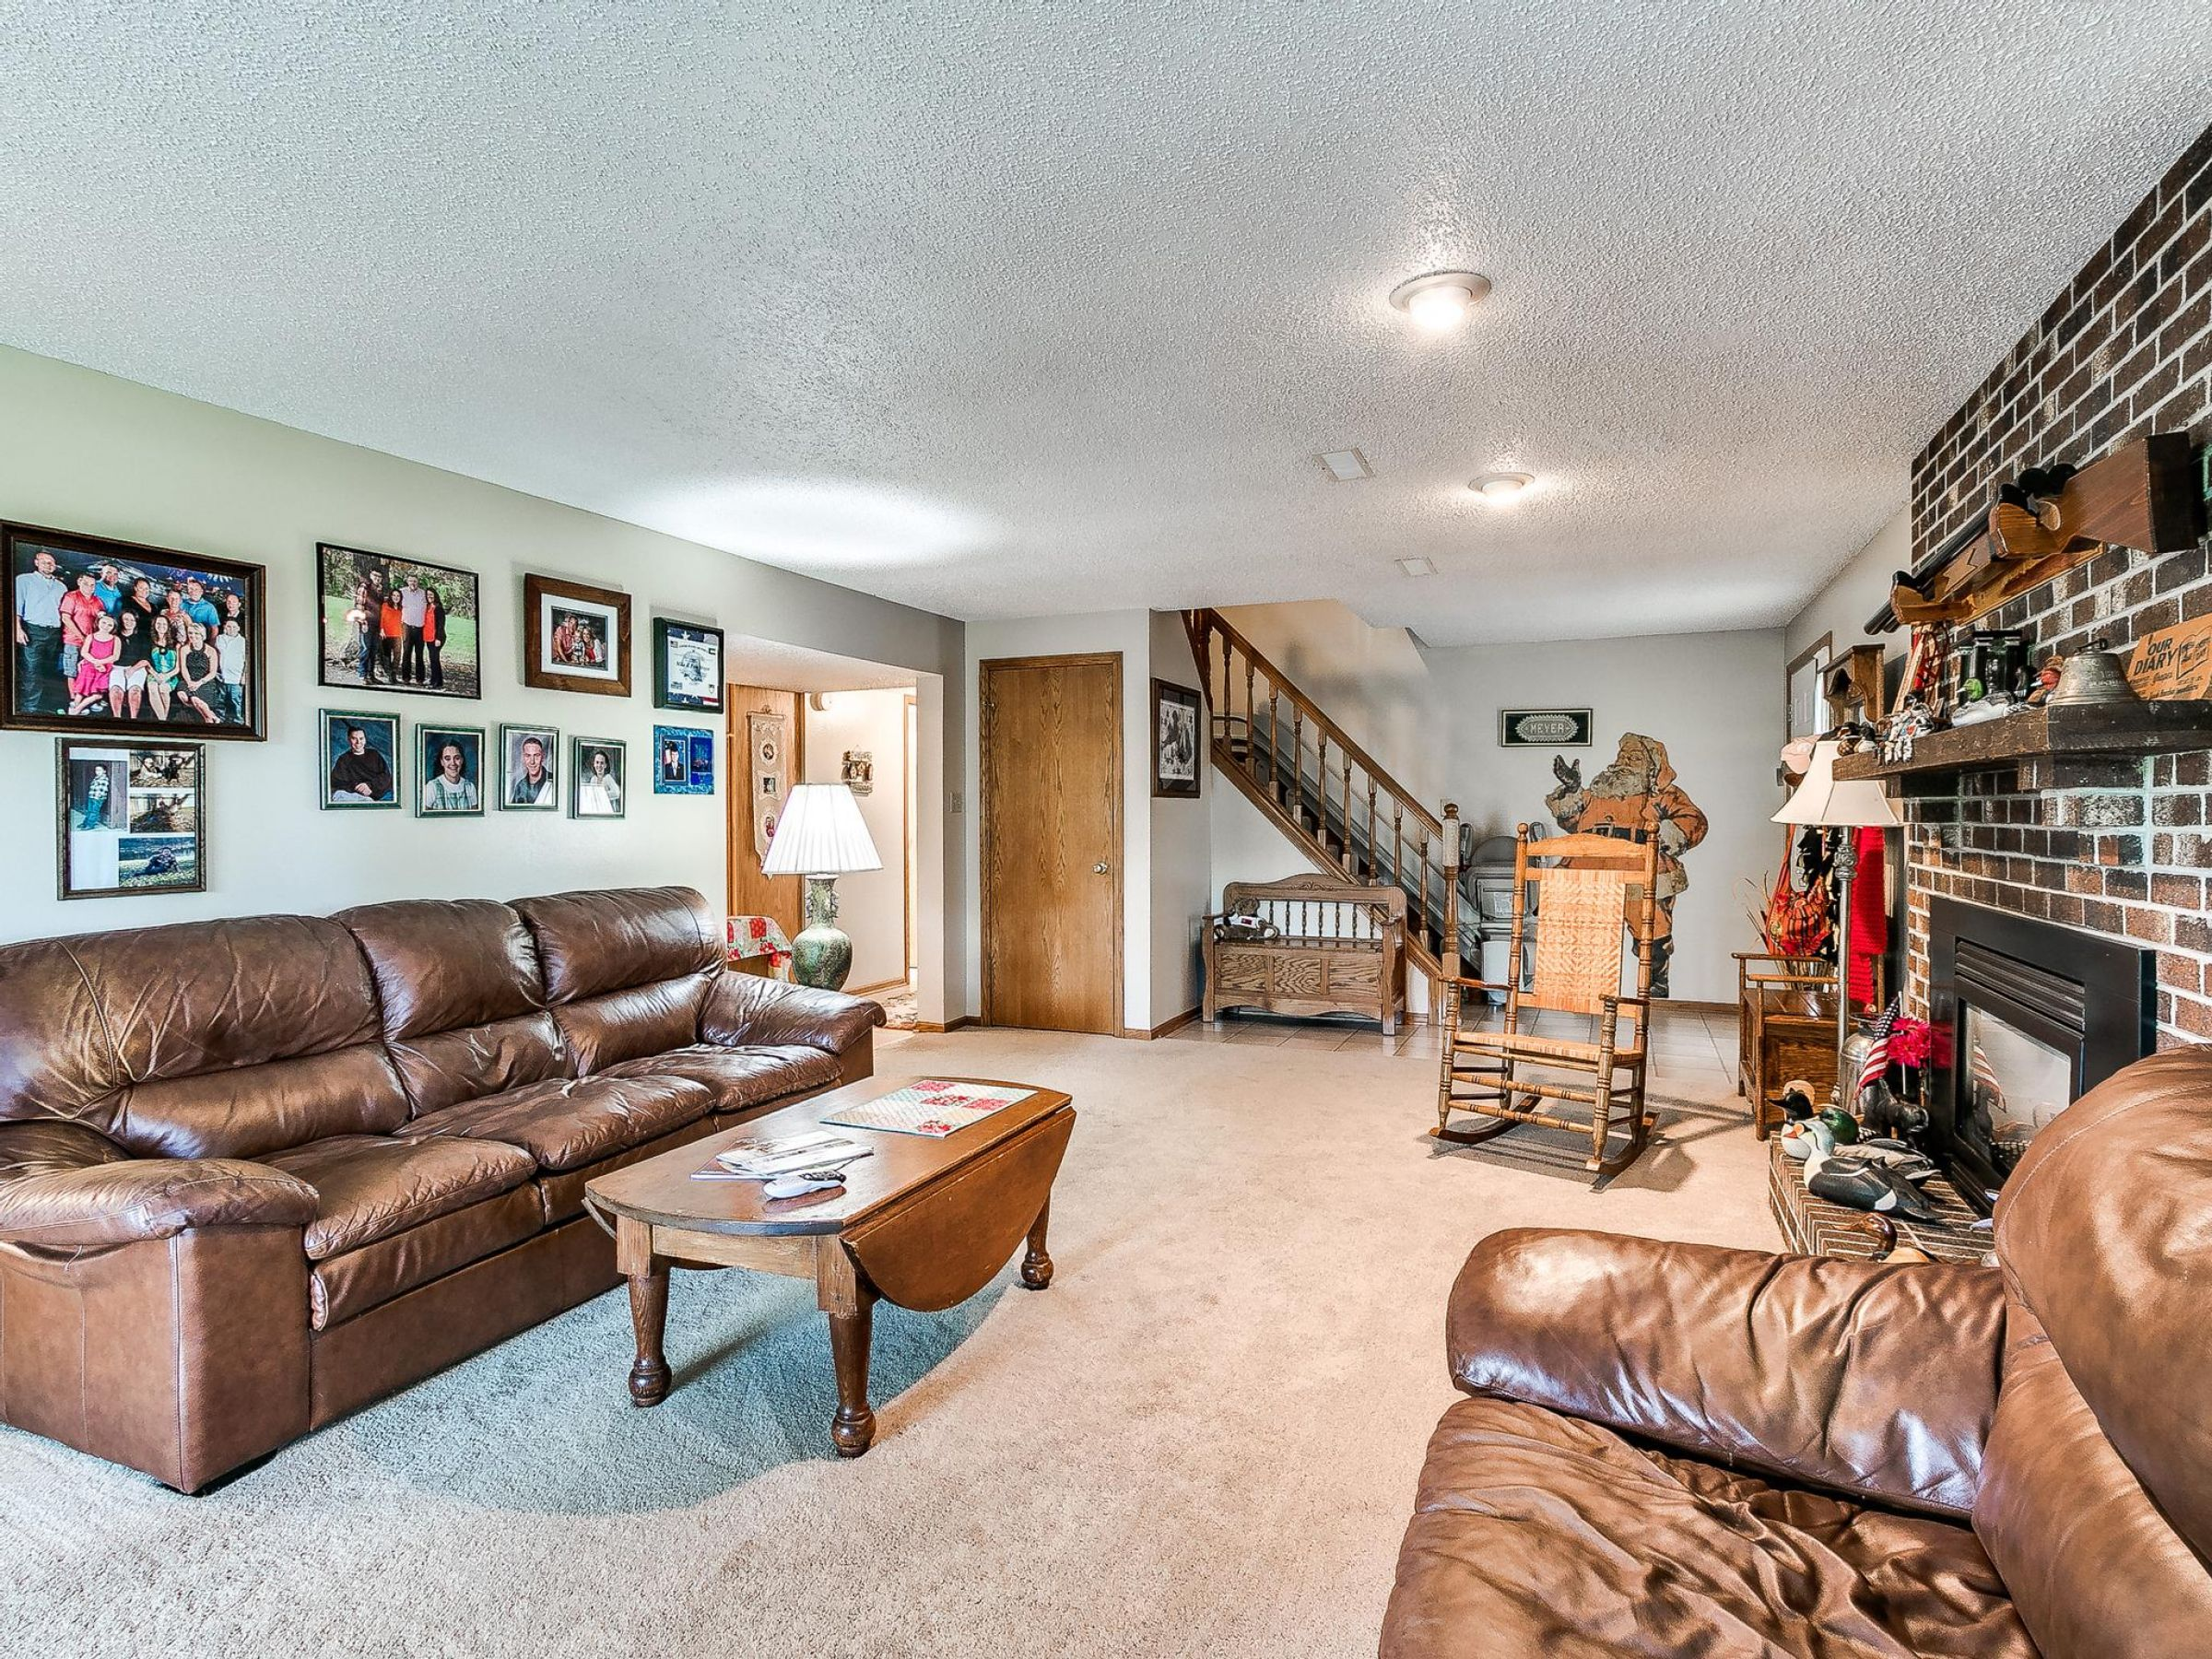 residential-warren-county-iowa-3-acres-listing-number-15593-2-2021-06-18-155239.jpg